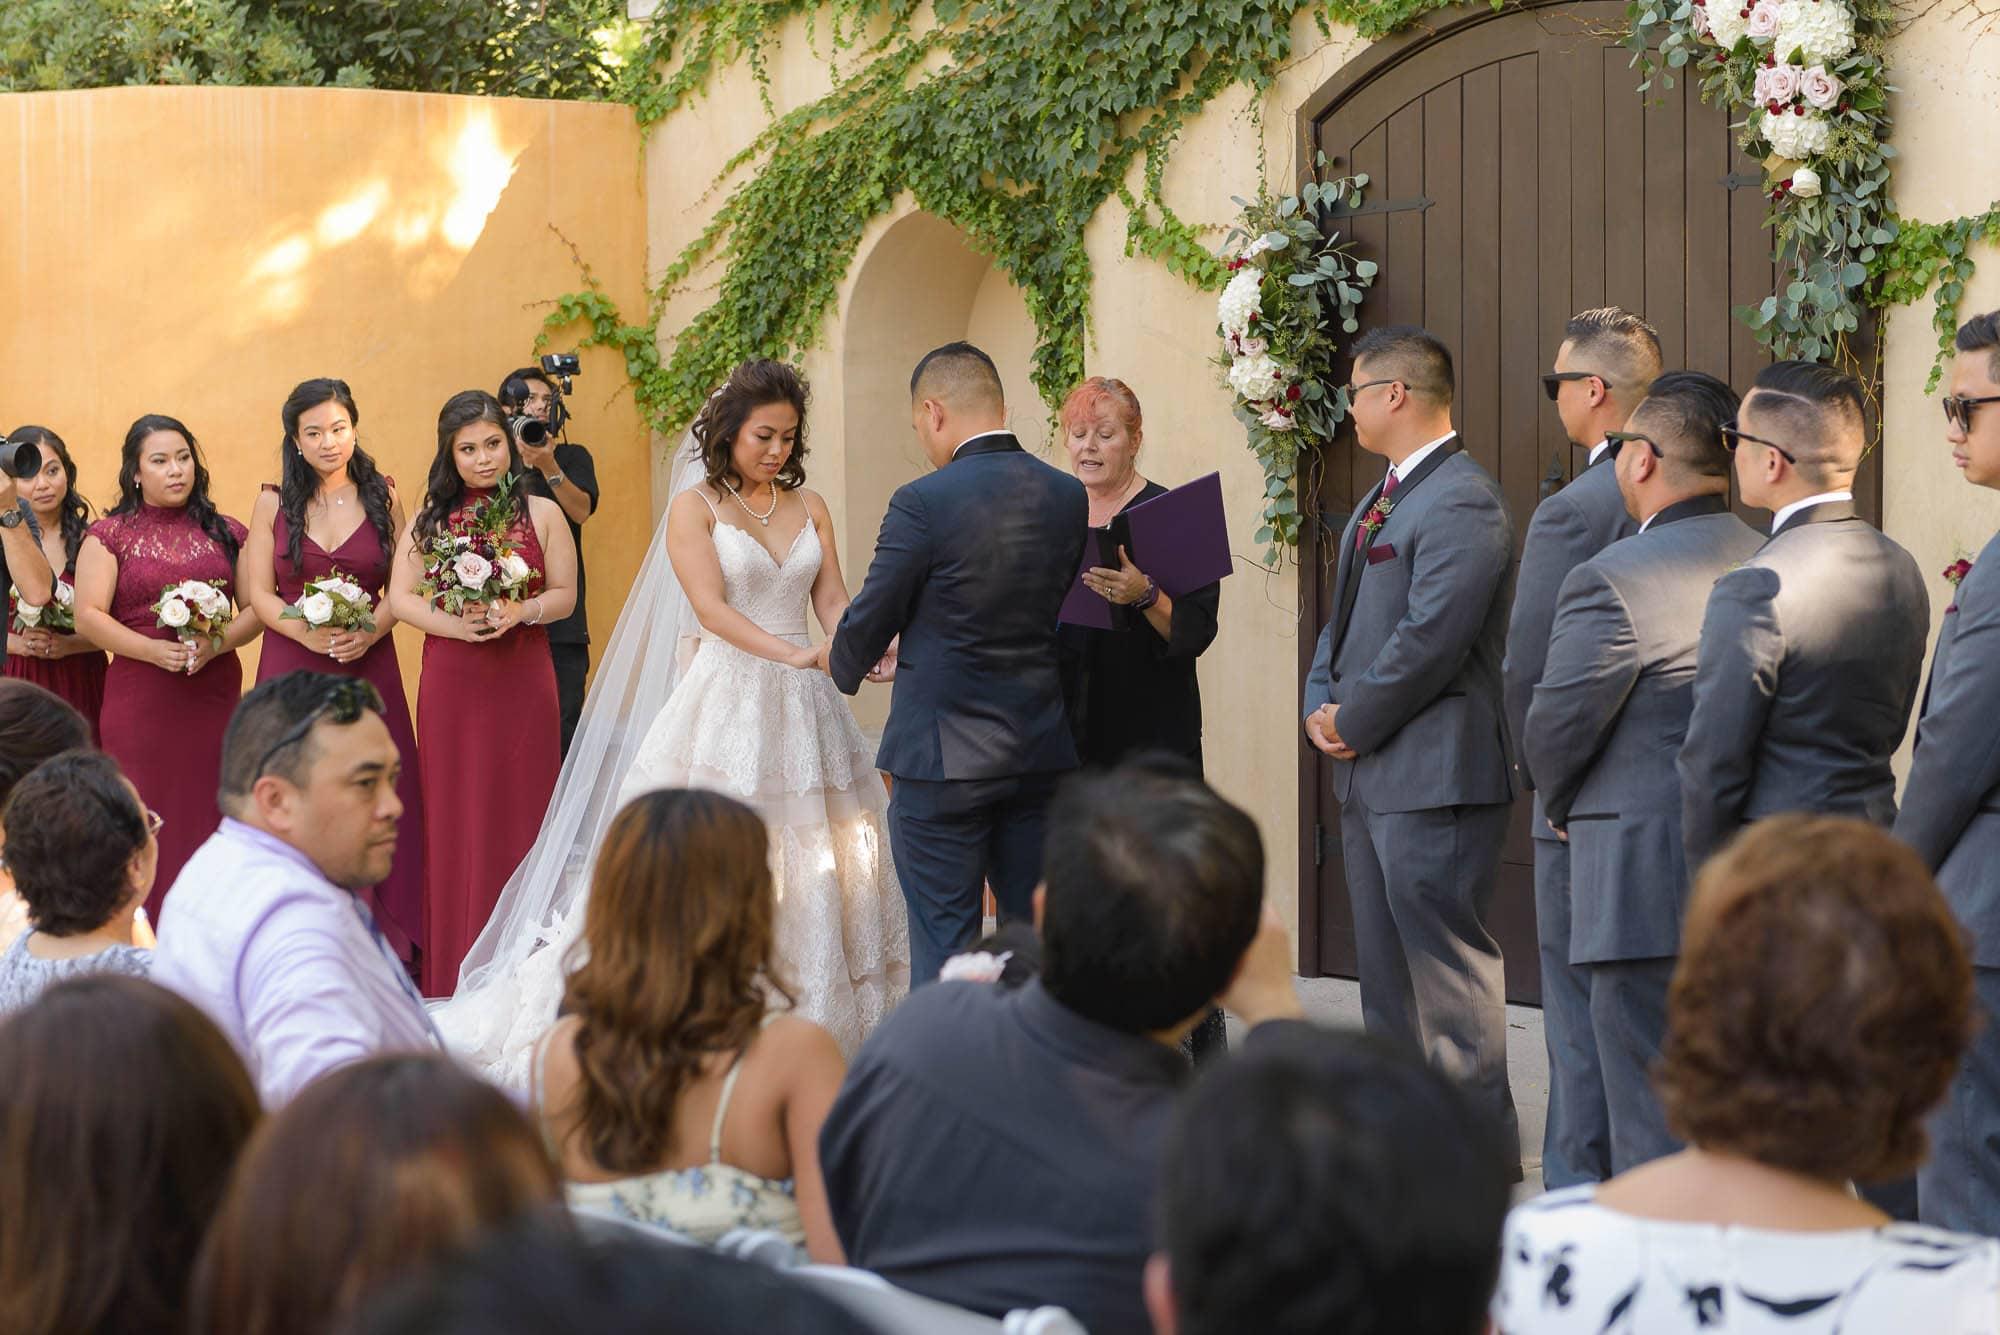 016_Alan_and_Heidi_Wedding_Karla_Paolo